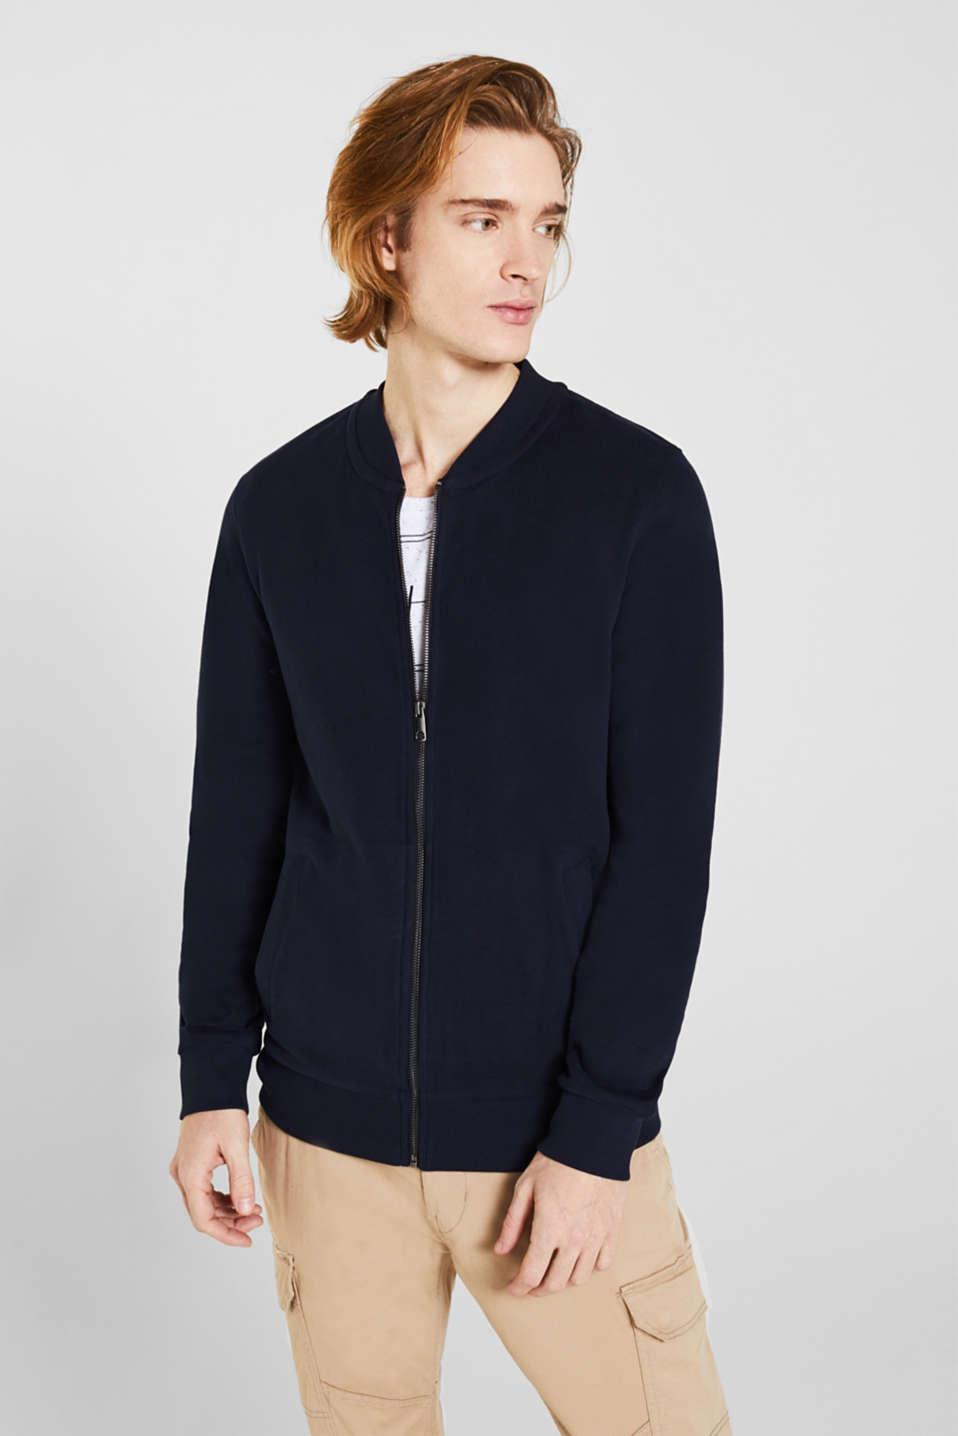 edc Bomber style sweatshirt jacket, 100% cotton at our